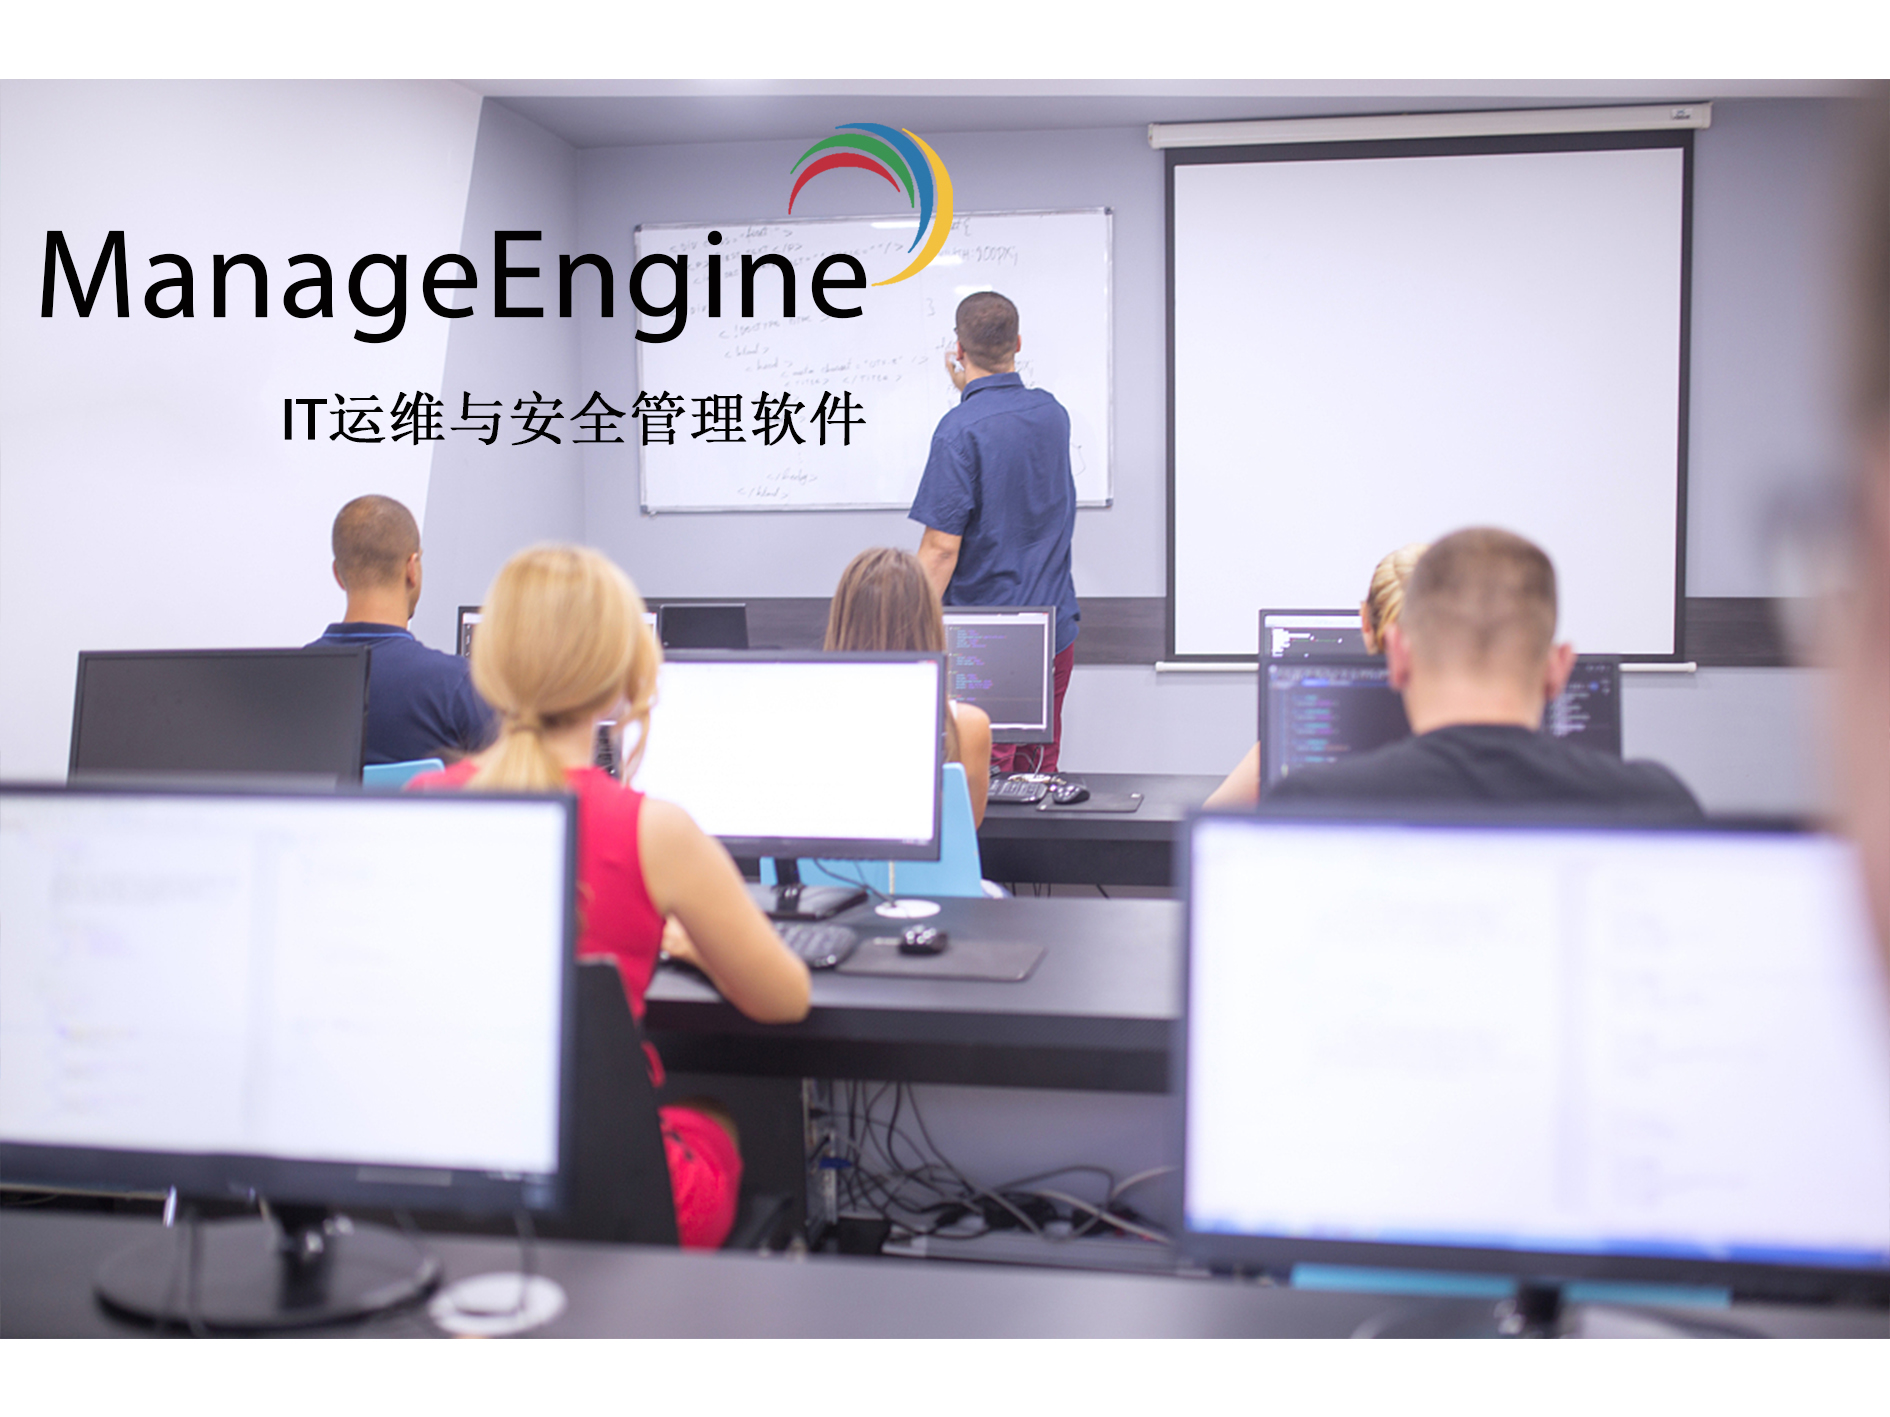 IT资产全生命周期管理 - ManageEngine IT管理